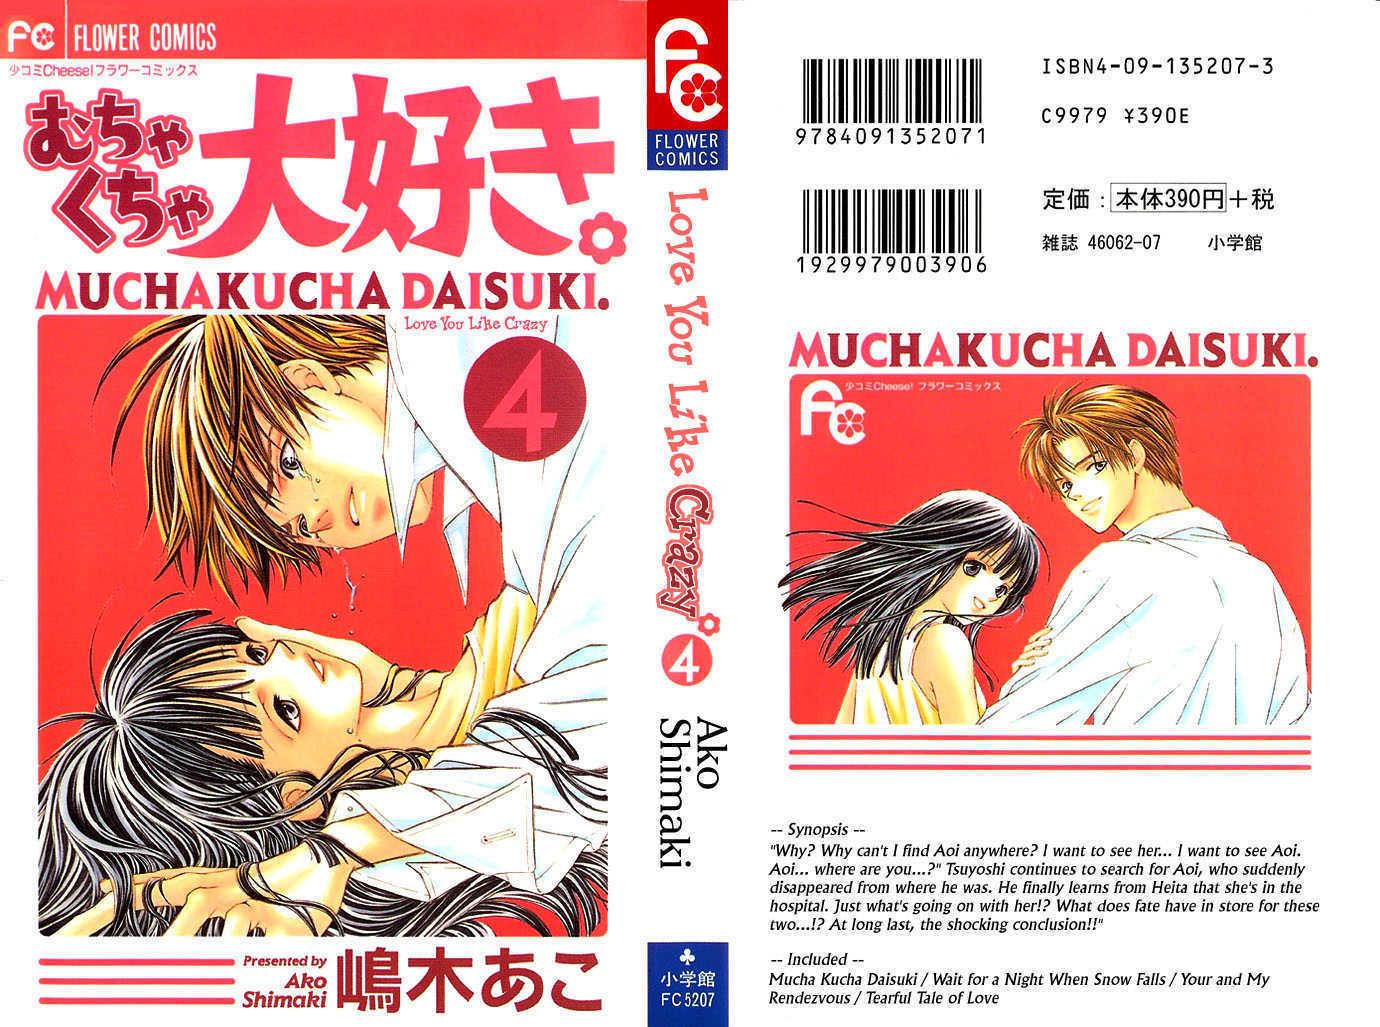 Mucha Kucha Daisuki 12 Page 3